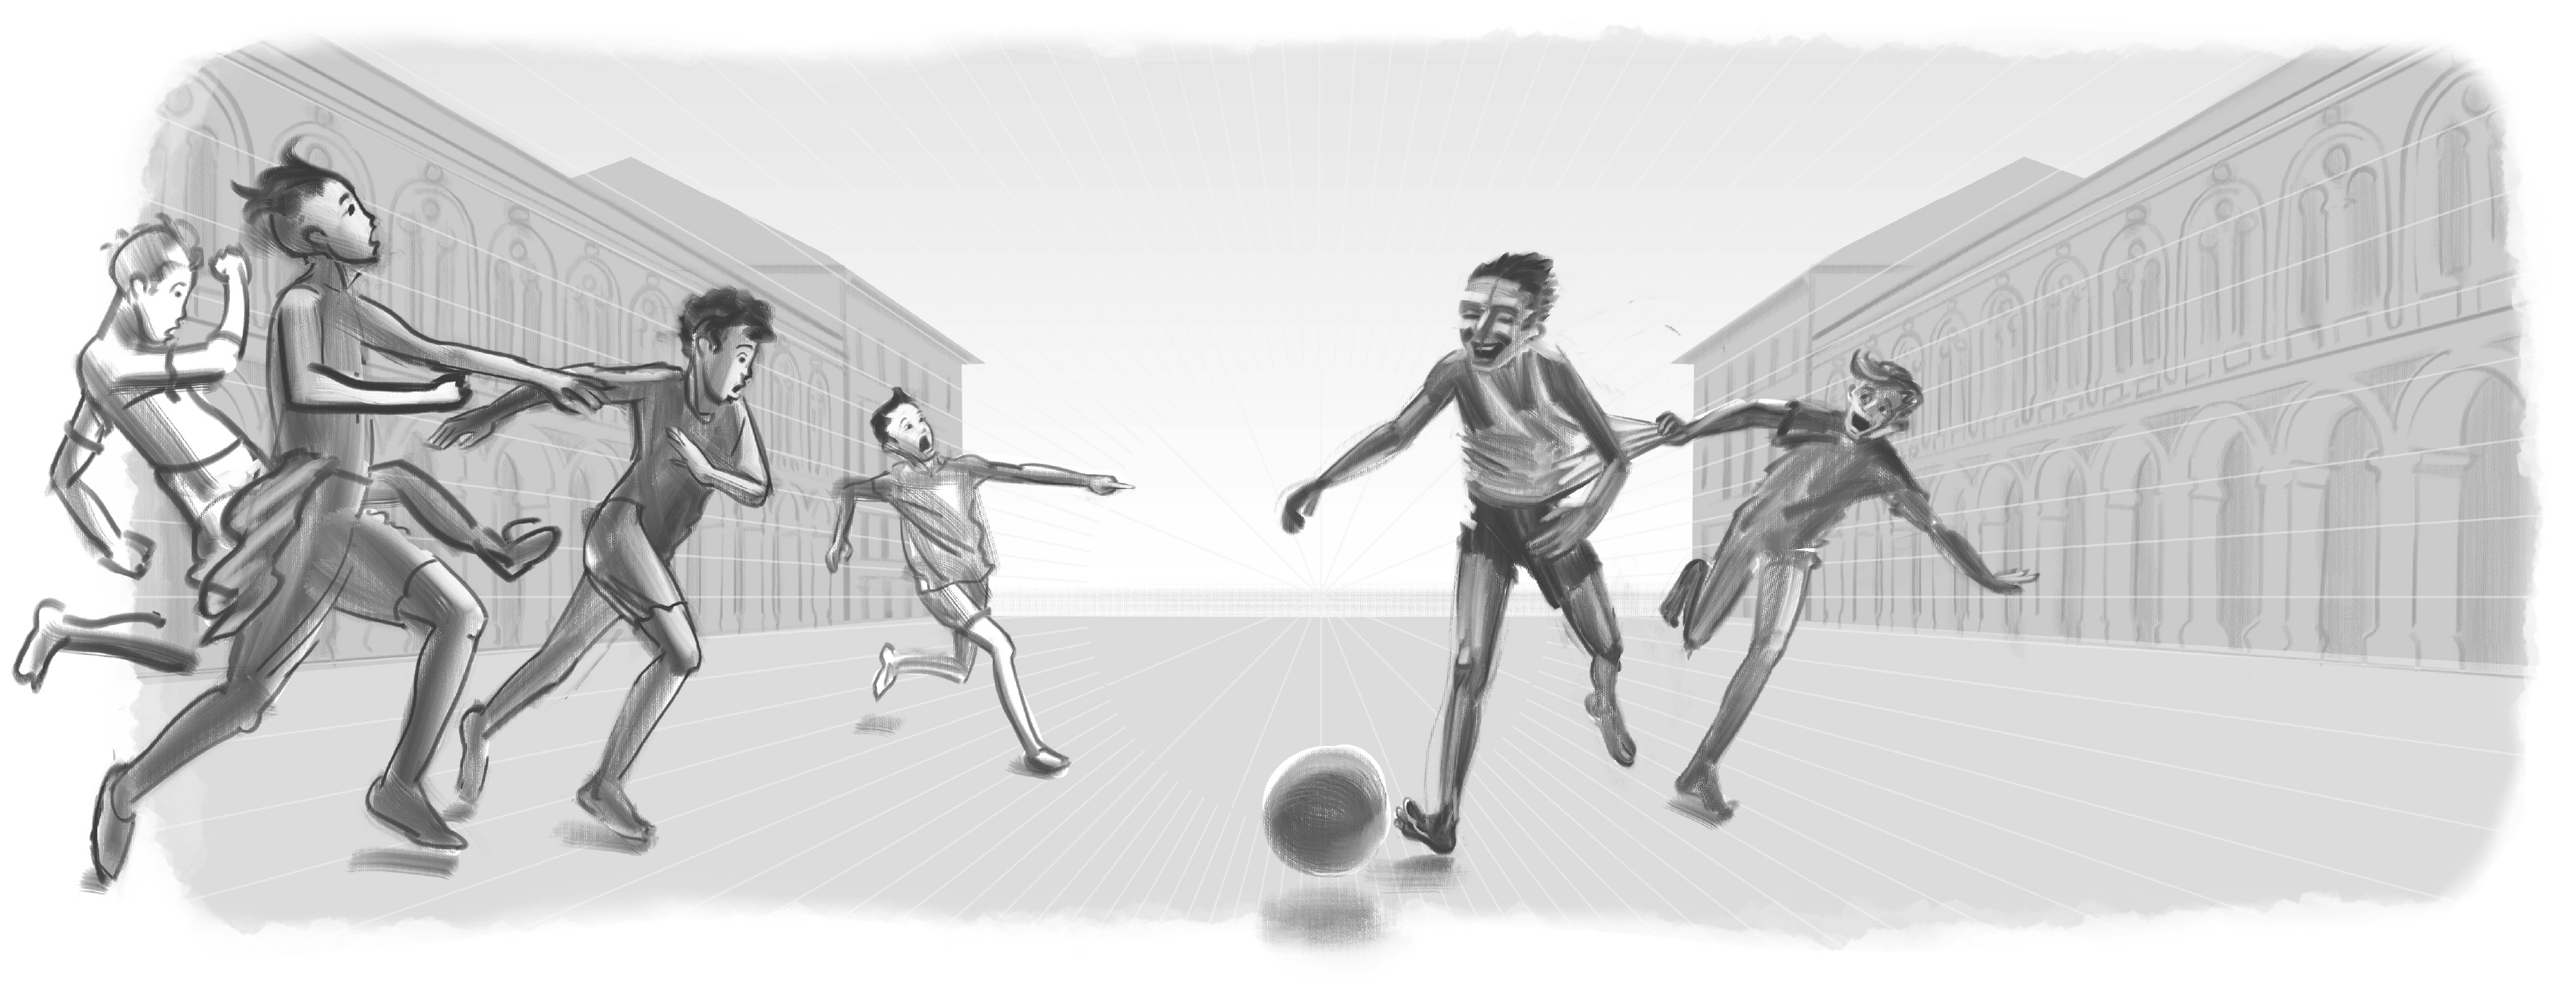 Croatia World Cup Doodle Sketch